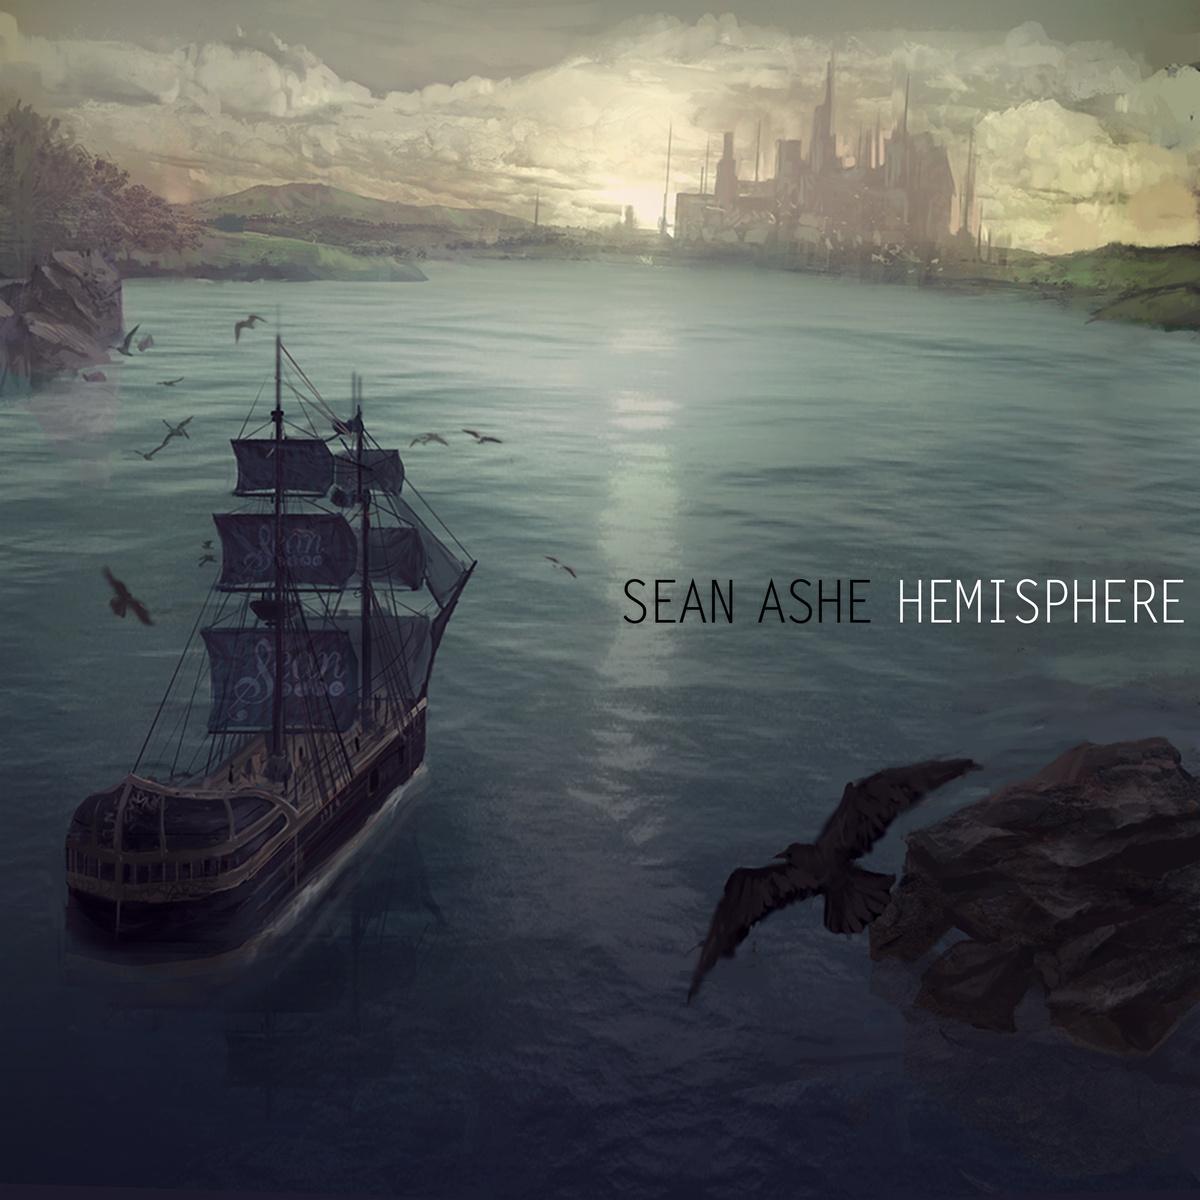 sean ashe hemisphere